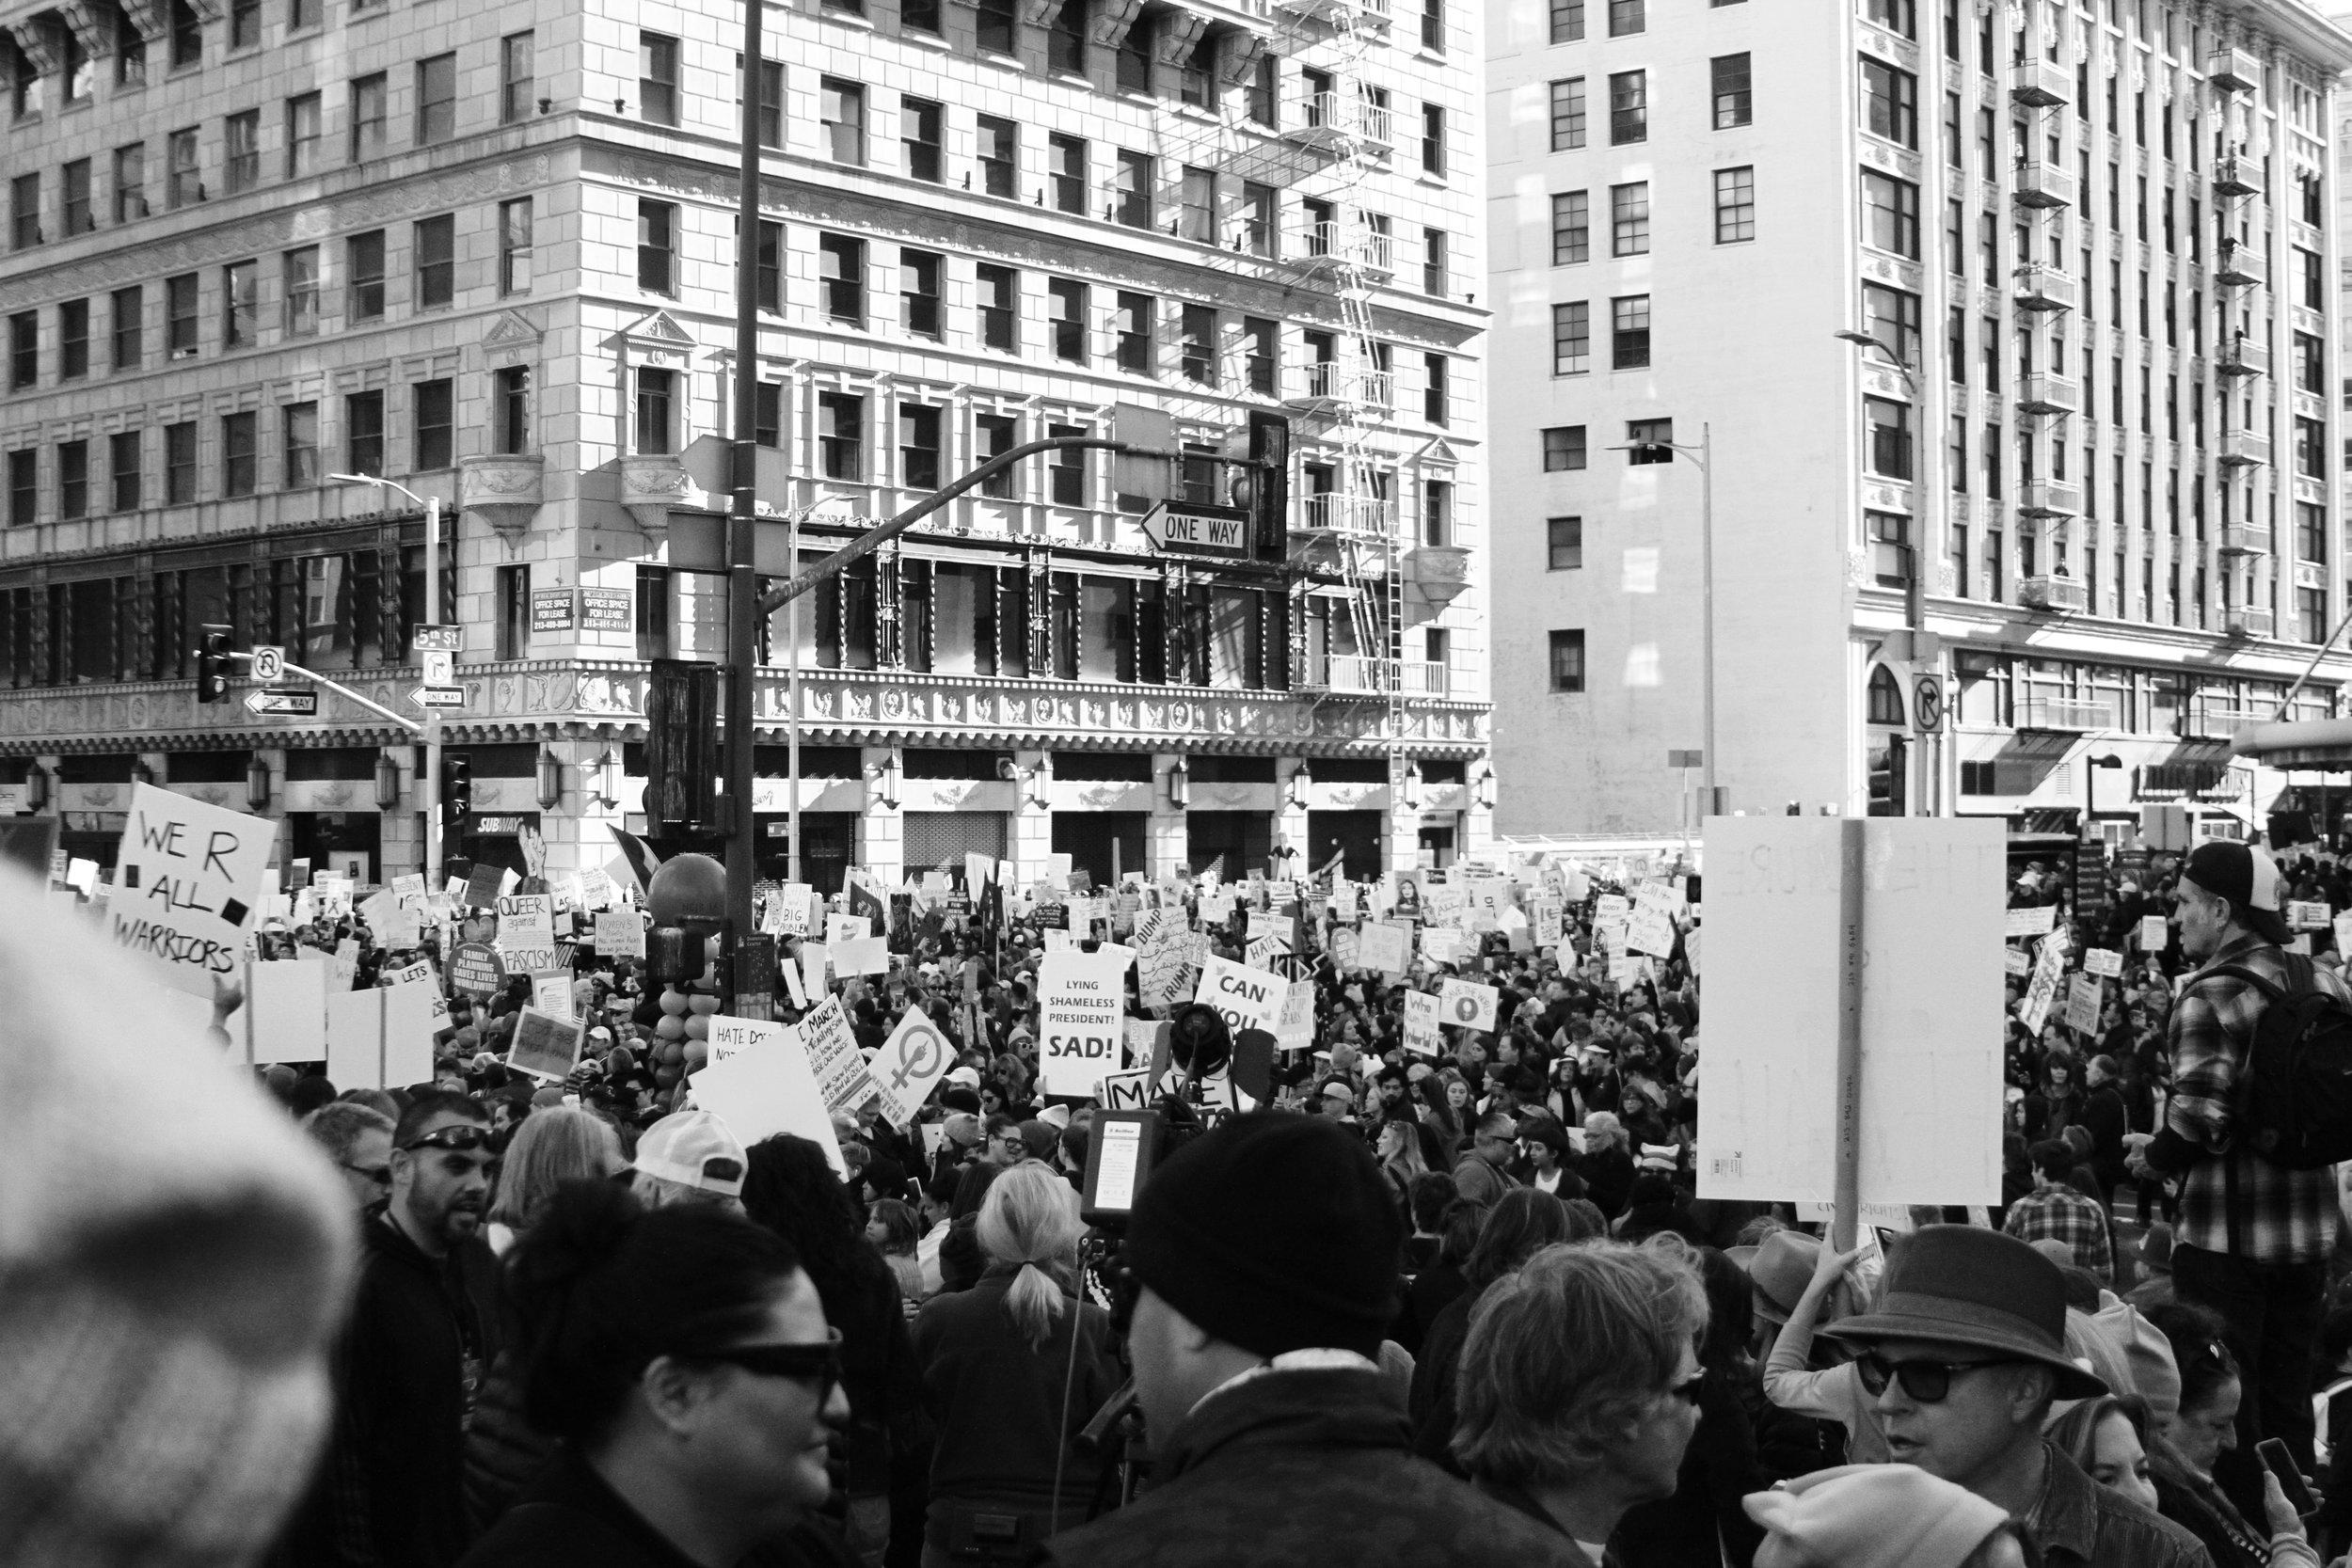 public discourse protest Photo by Alyssa Kibiloski on Unsplash